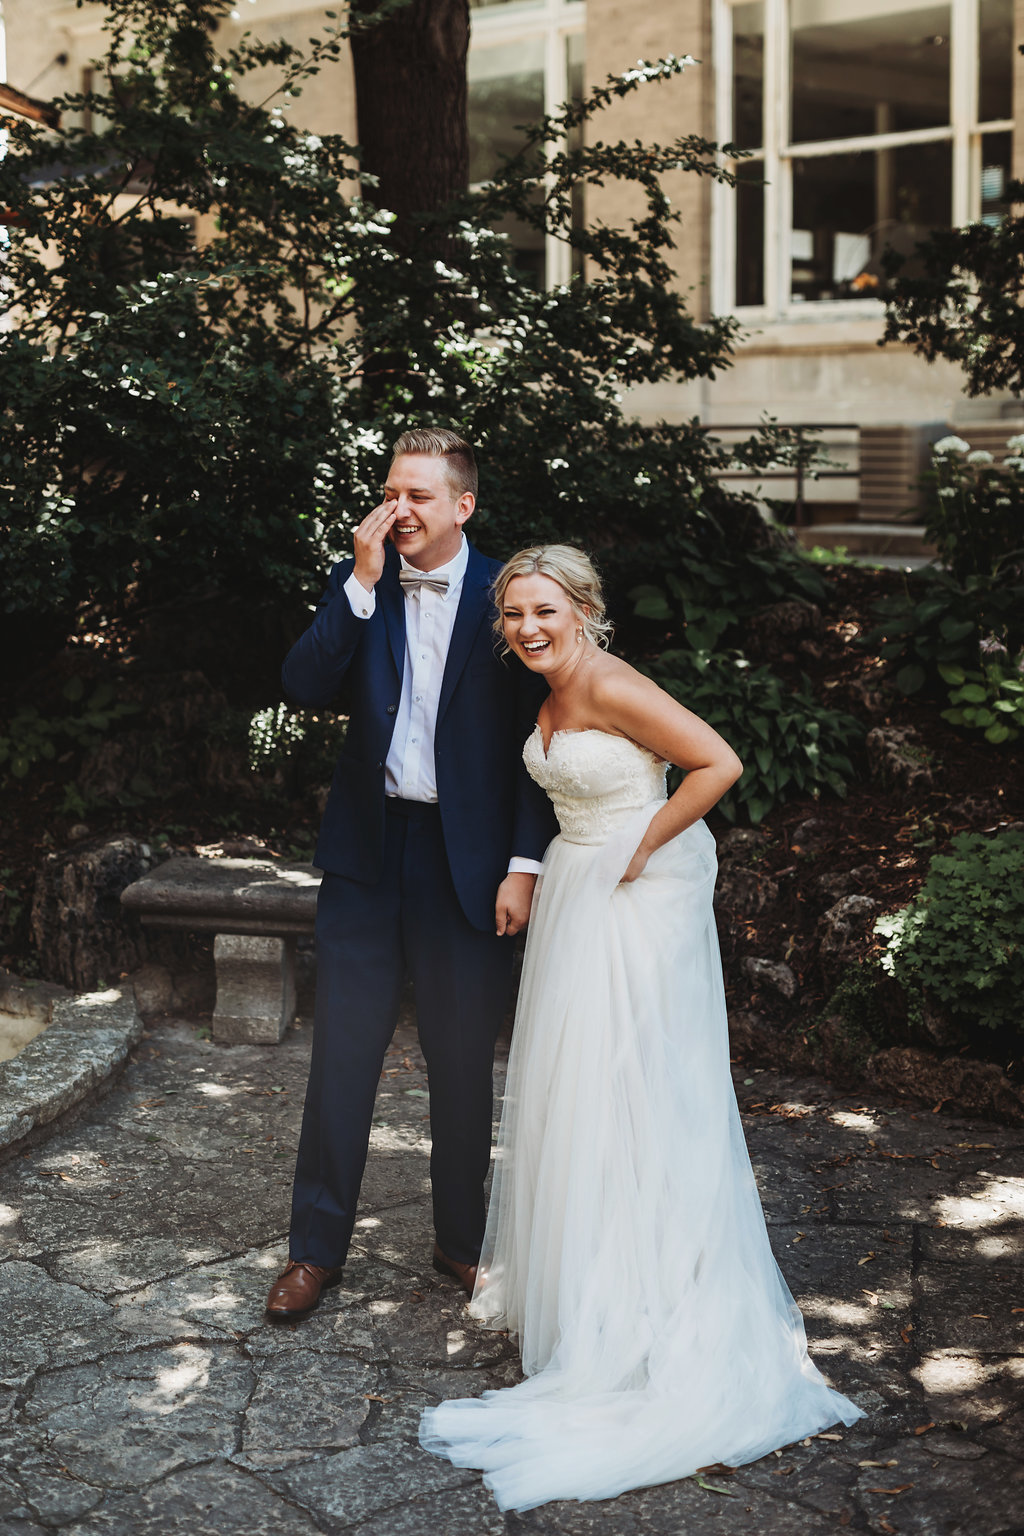 engle-olson-katie-dalton-wedding-clewell-photography-18.jpg